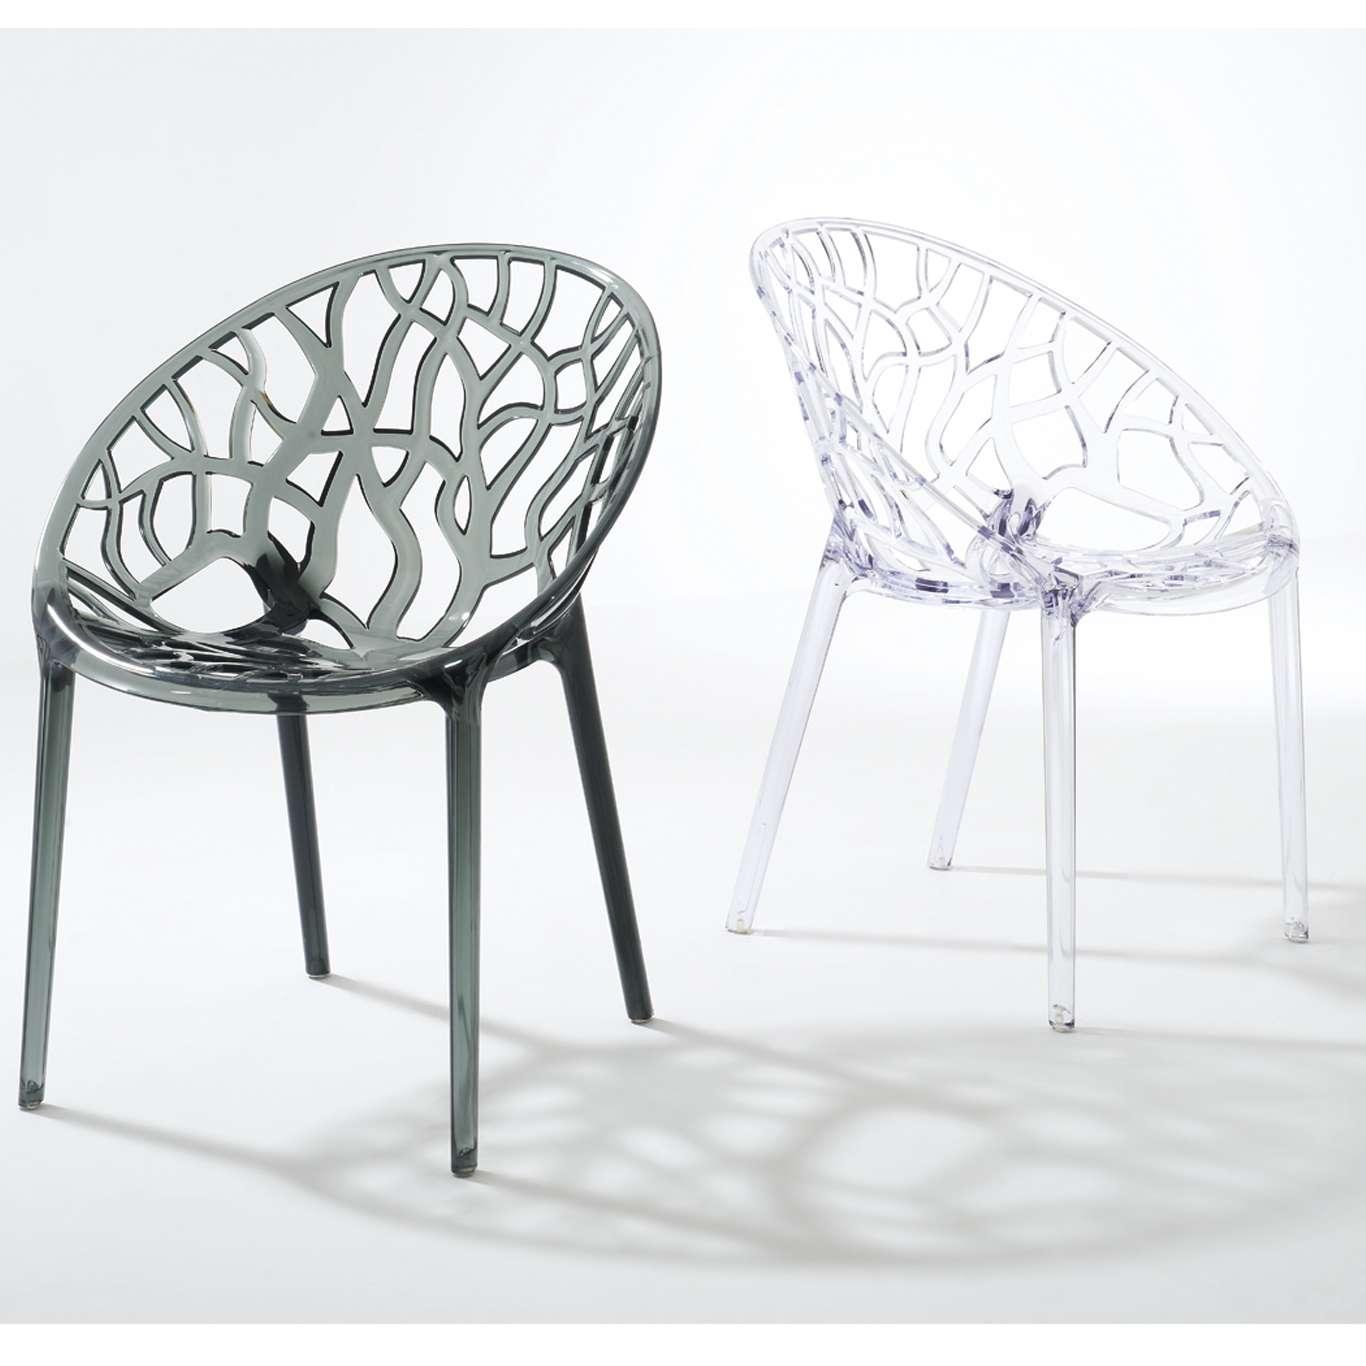 4x sedie policarbonato trasparente sedia design stile - Sedia trasparente kartell ...